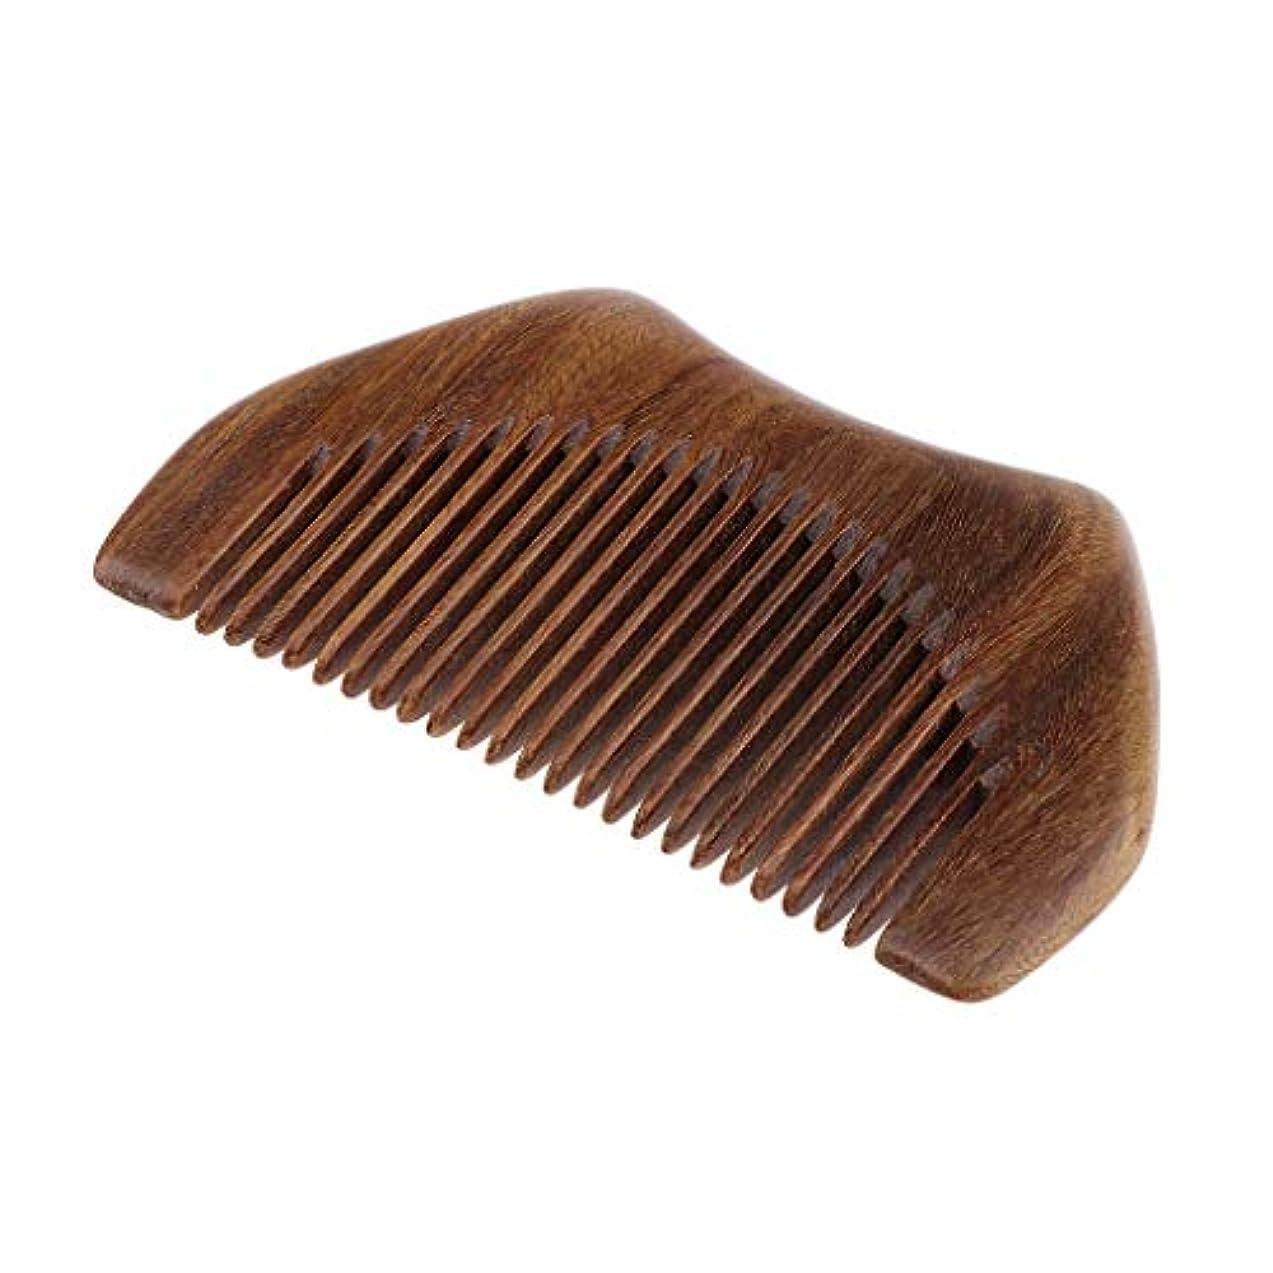 SM SunniMix ヘアコーム 木製櫛 静電気防止櫛 ヘアサロン くし